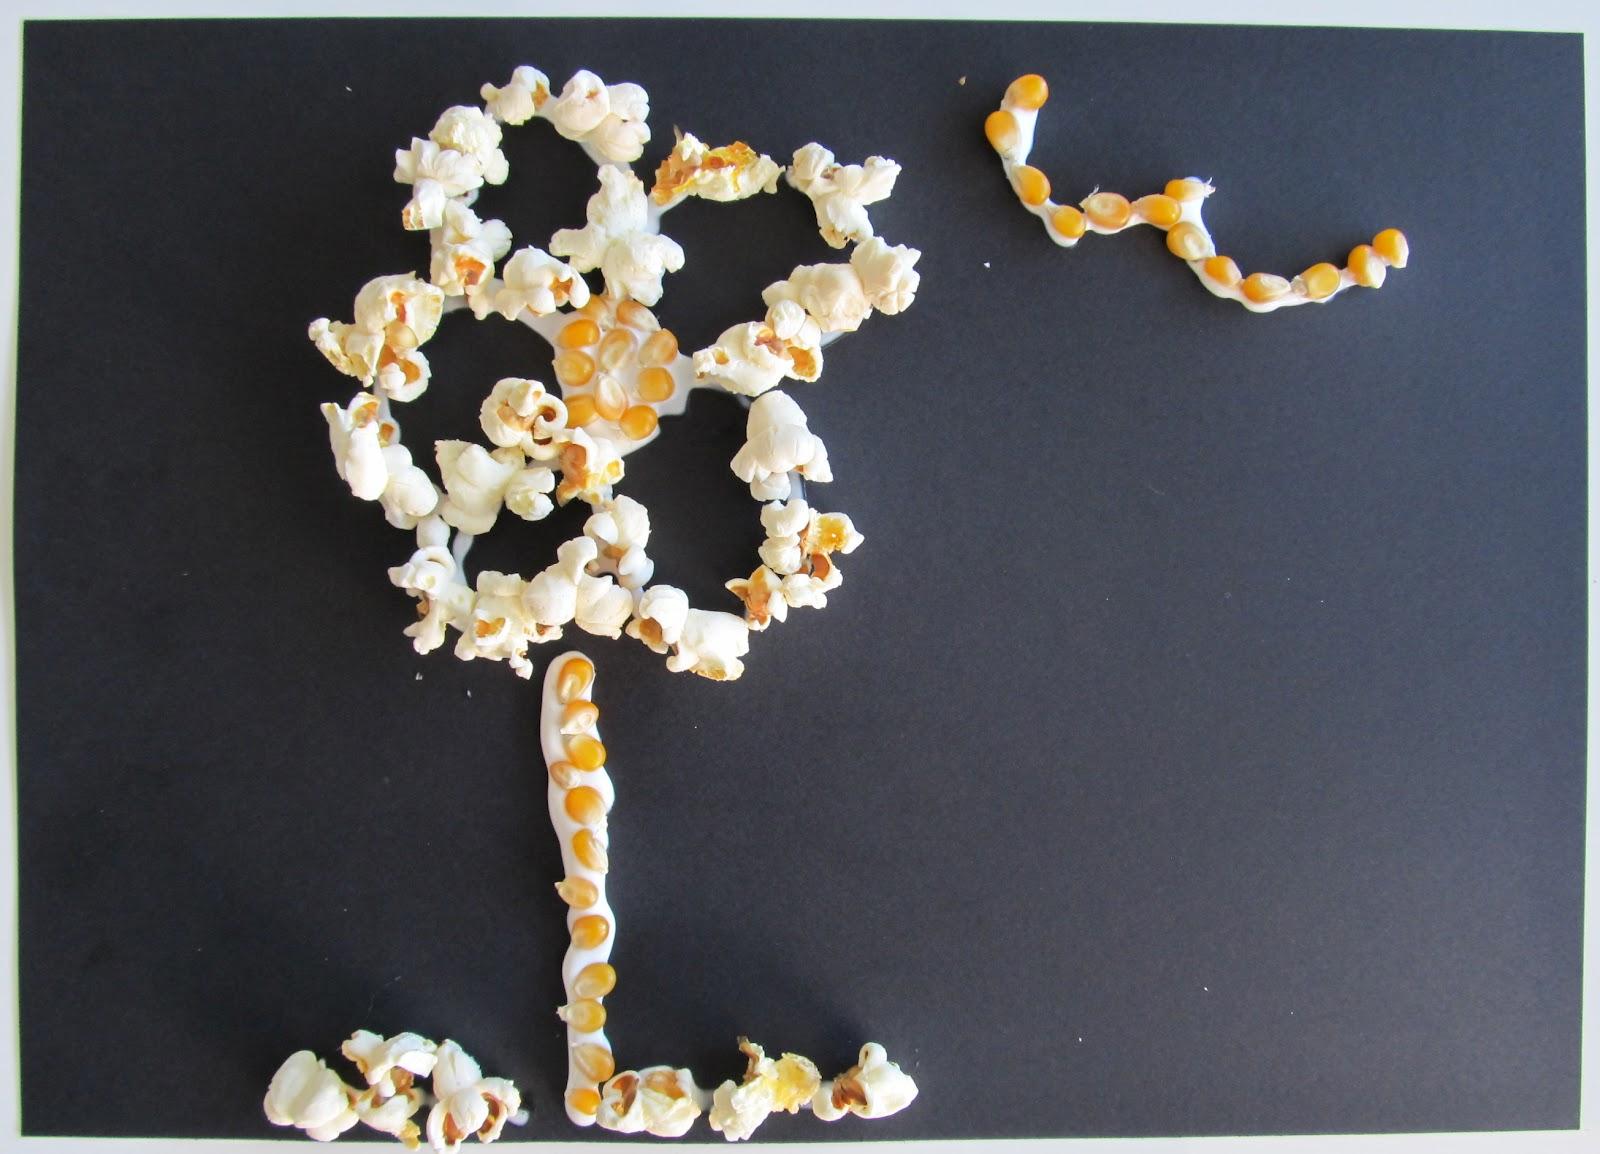 Plain Popcorn Popcorn Bags Using a Plain